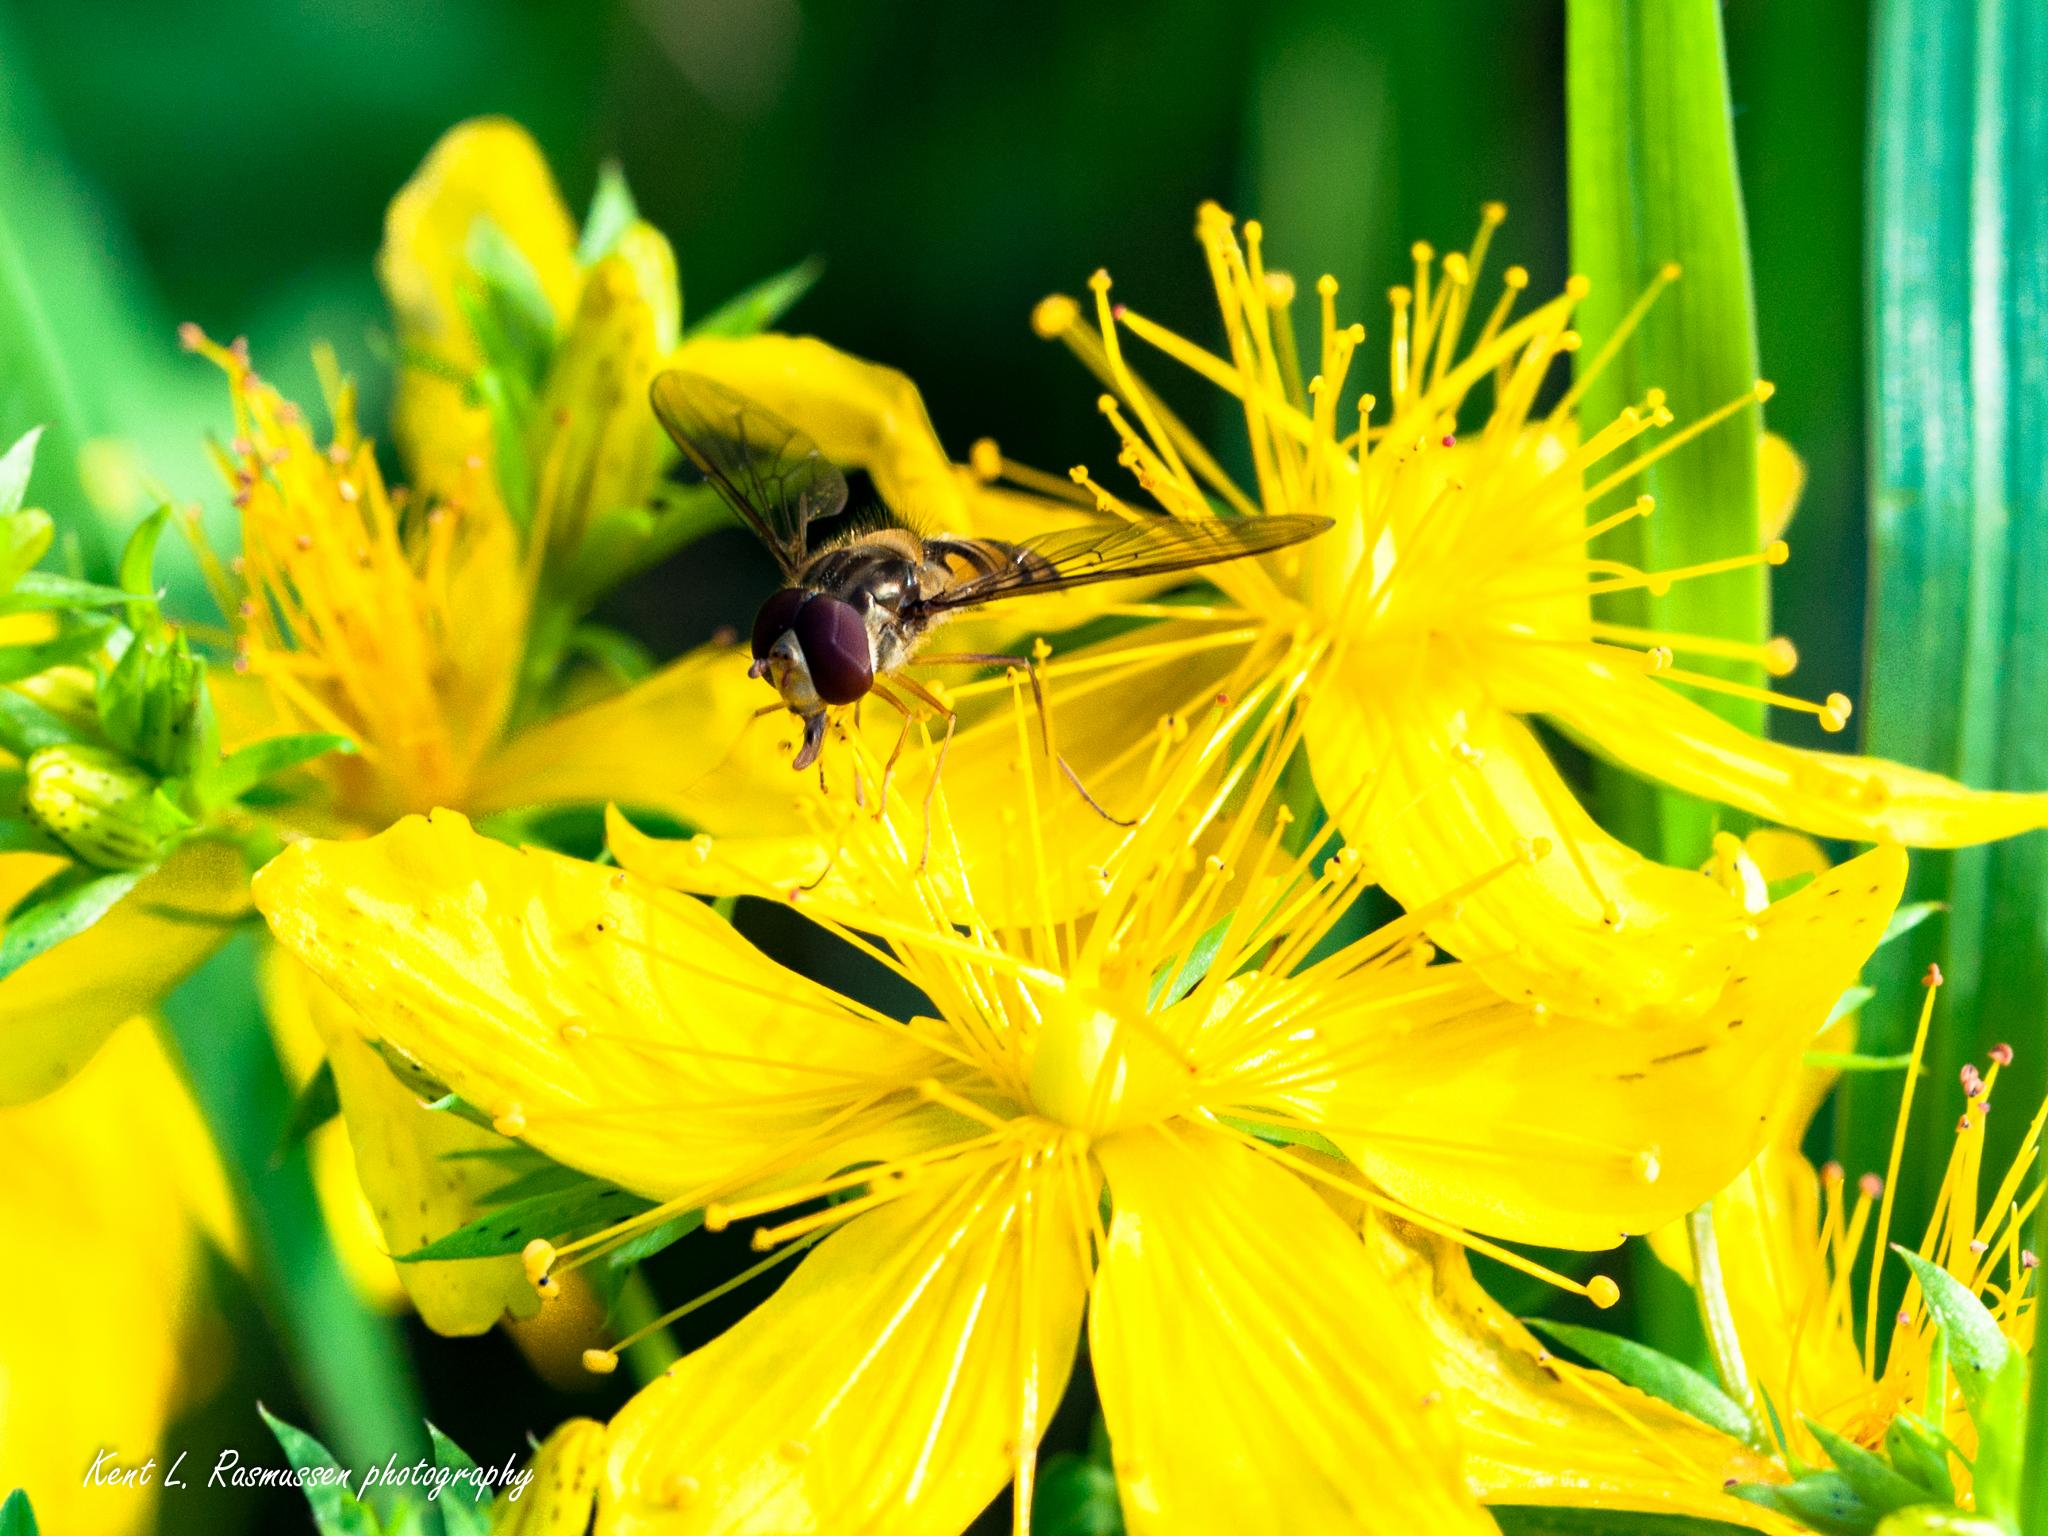 wild yellow flower by Kent L. Rasmussen